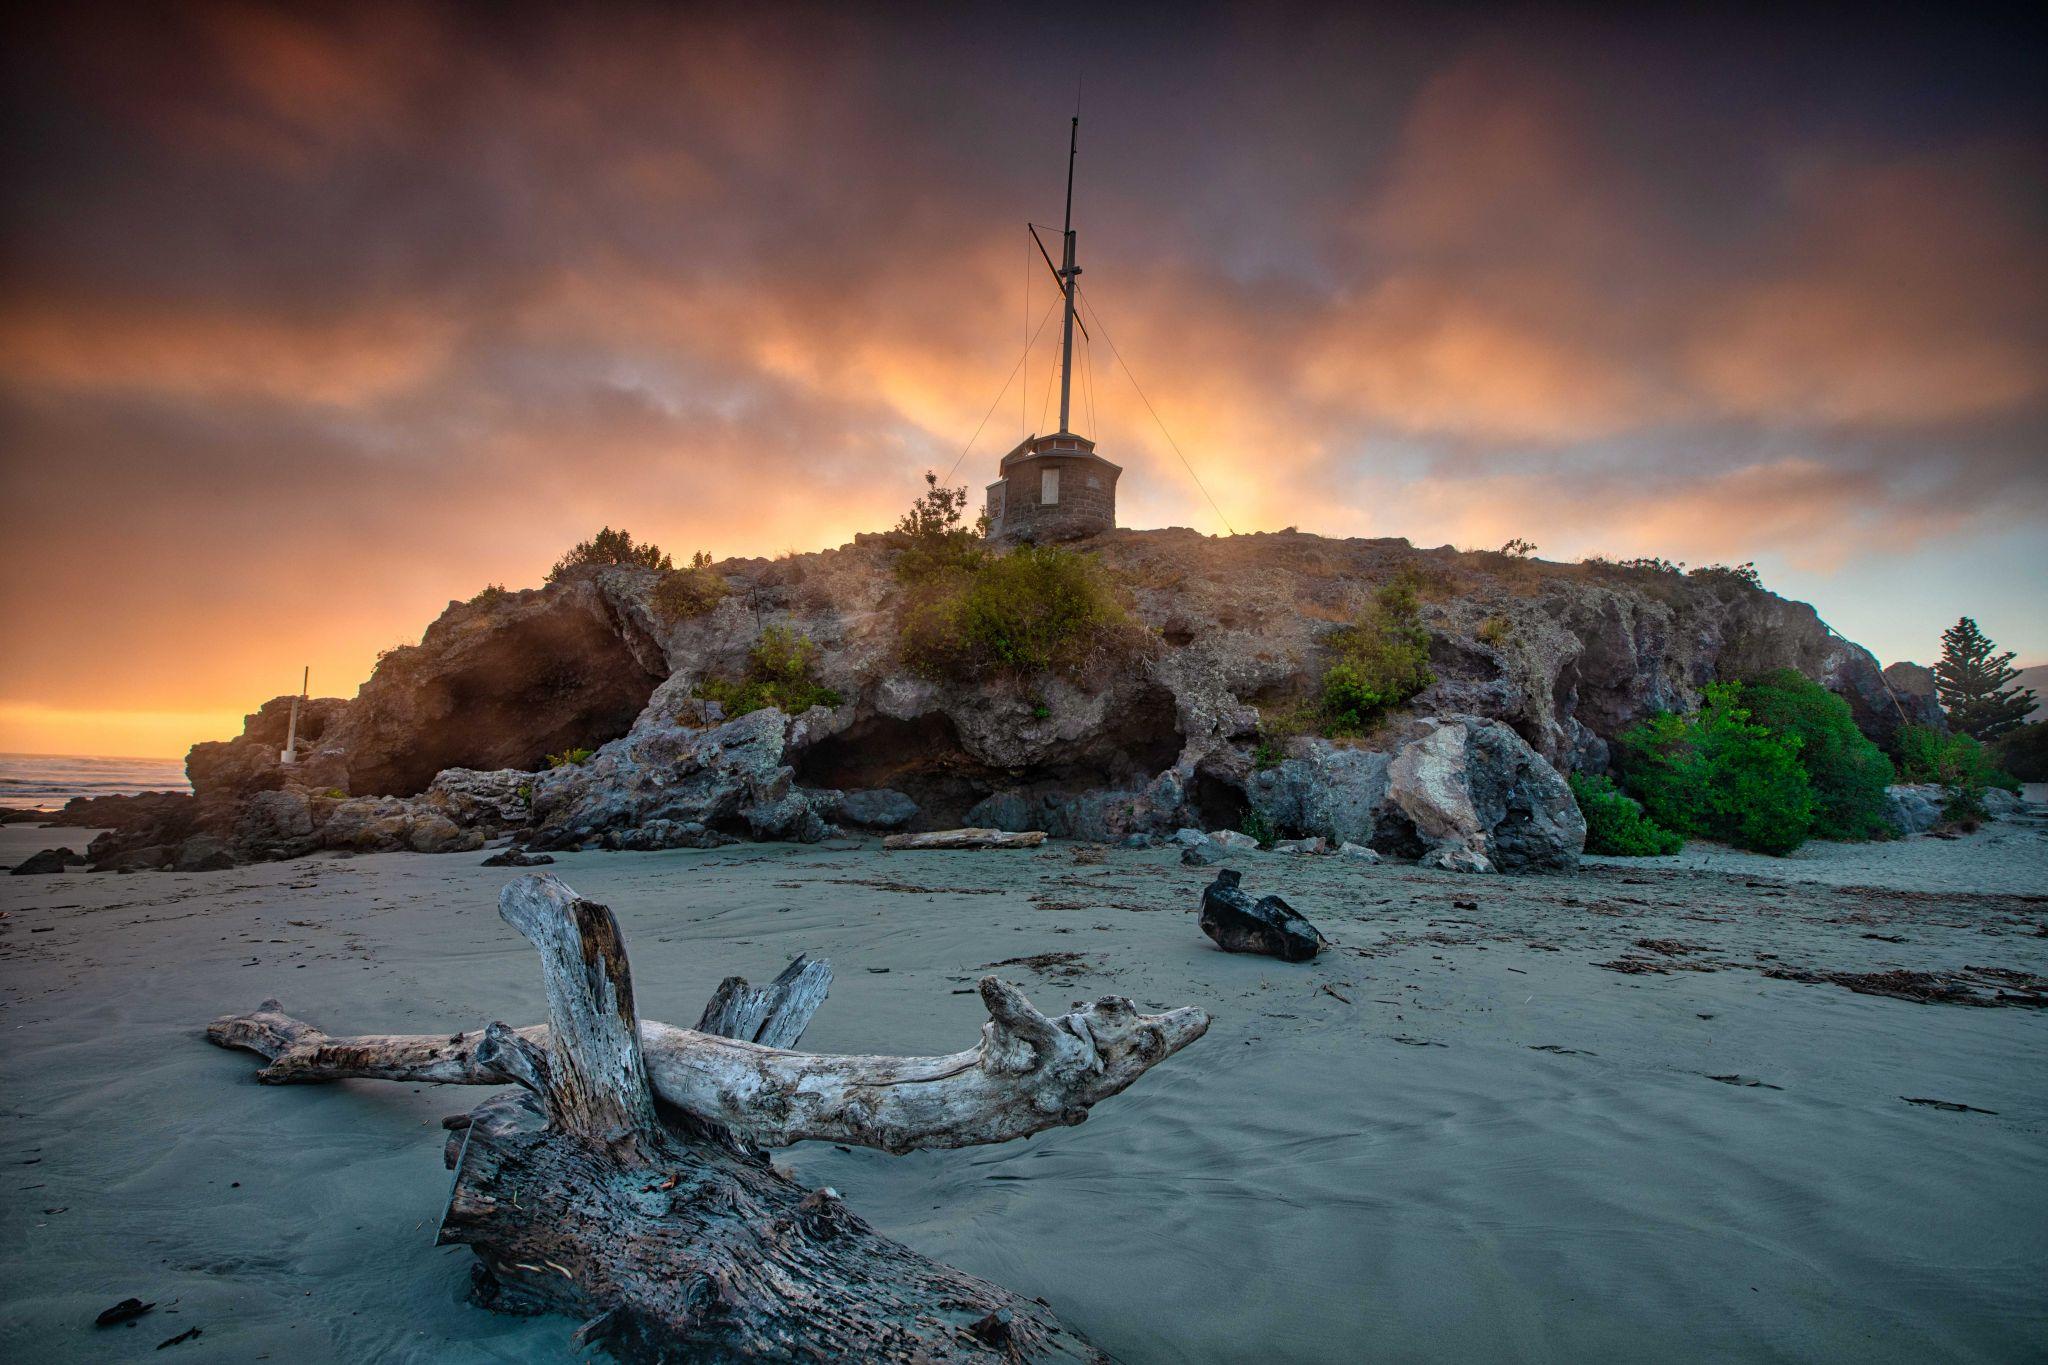 Cave Rock Tuawera Sumner Christchurch South Island, New Zealand